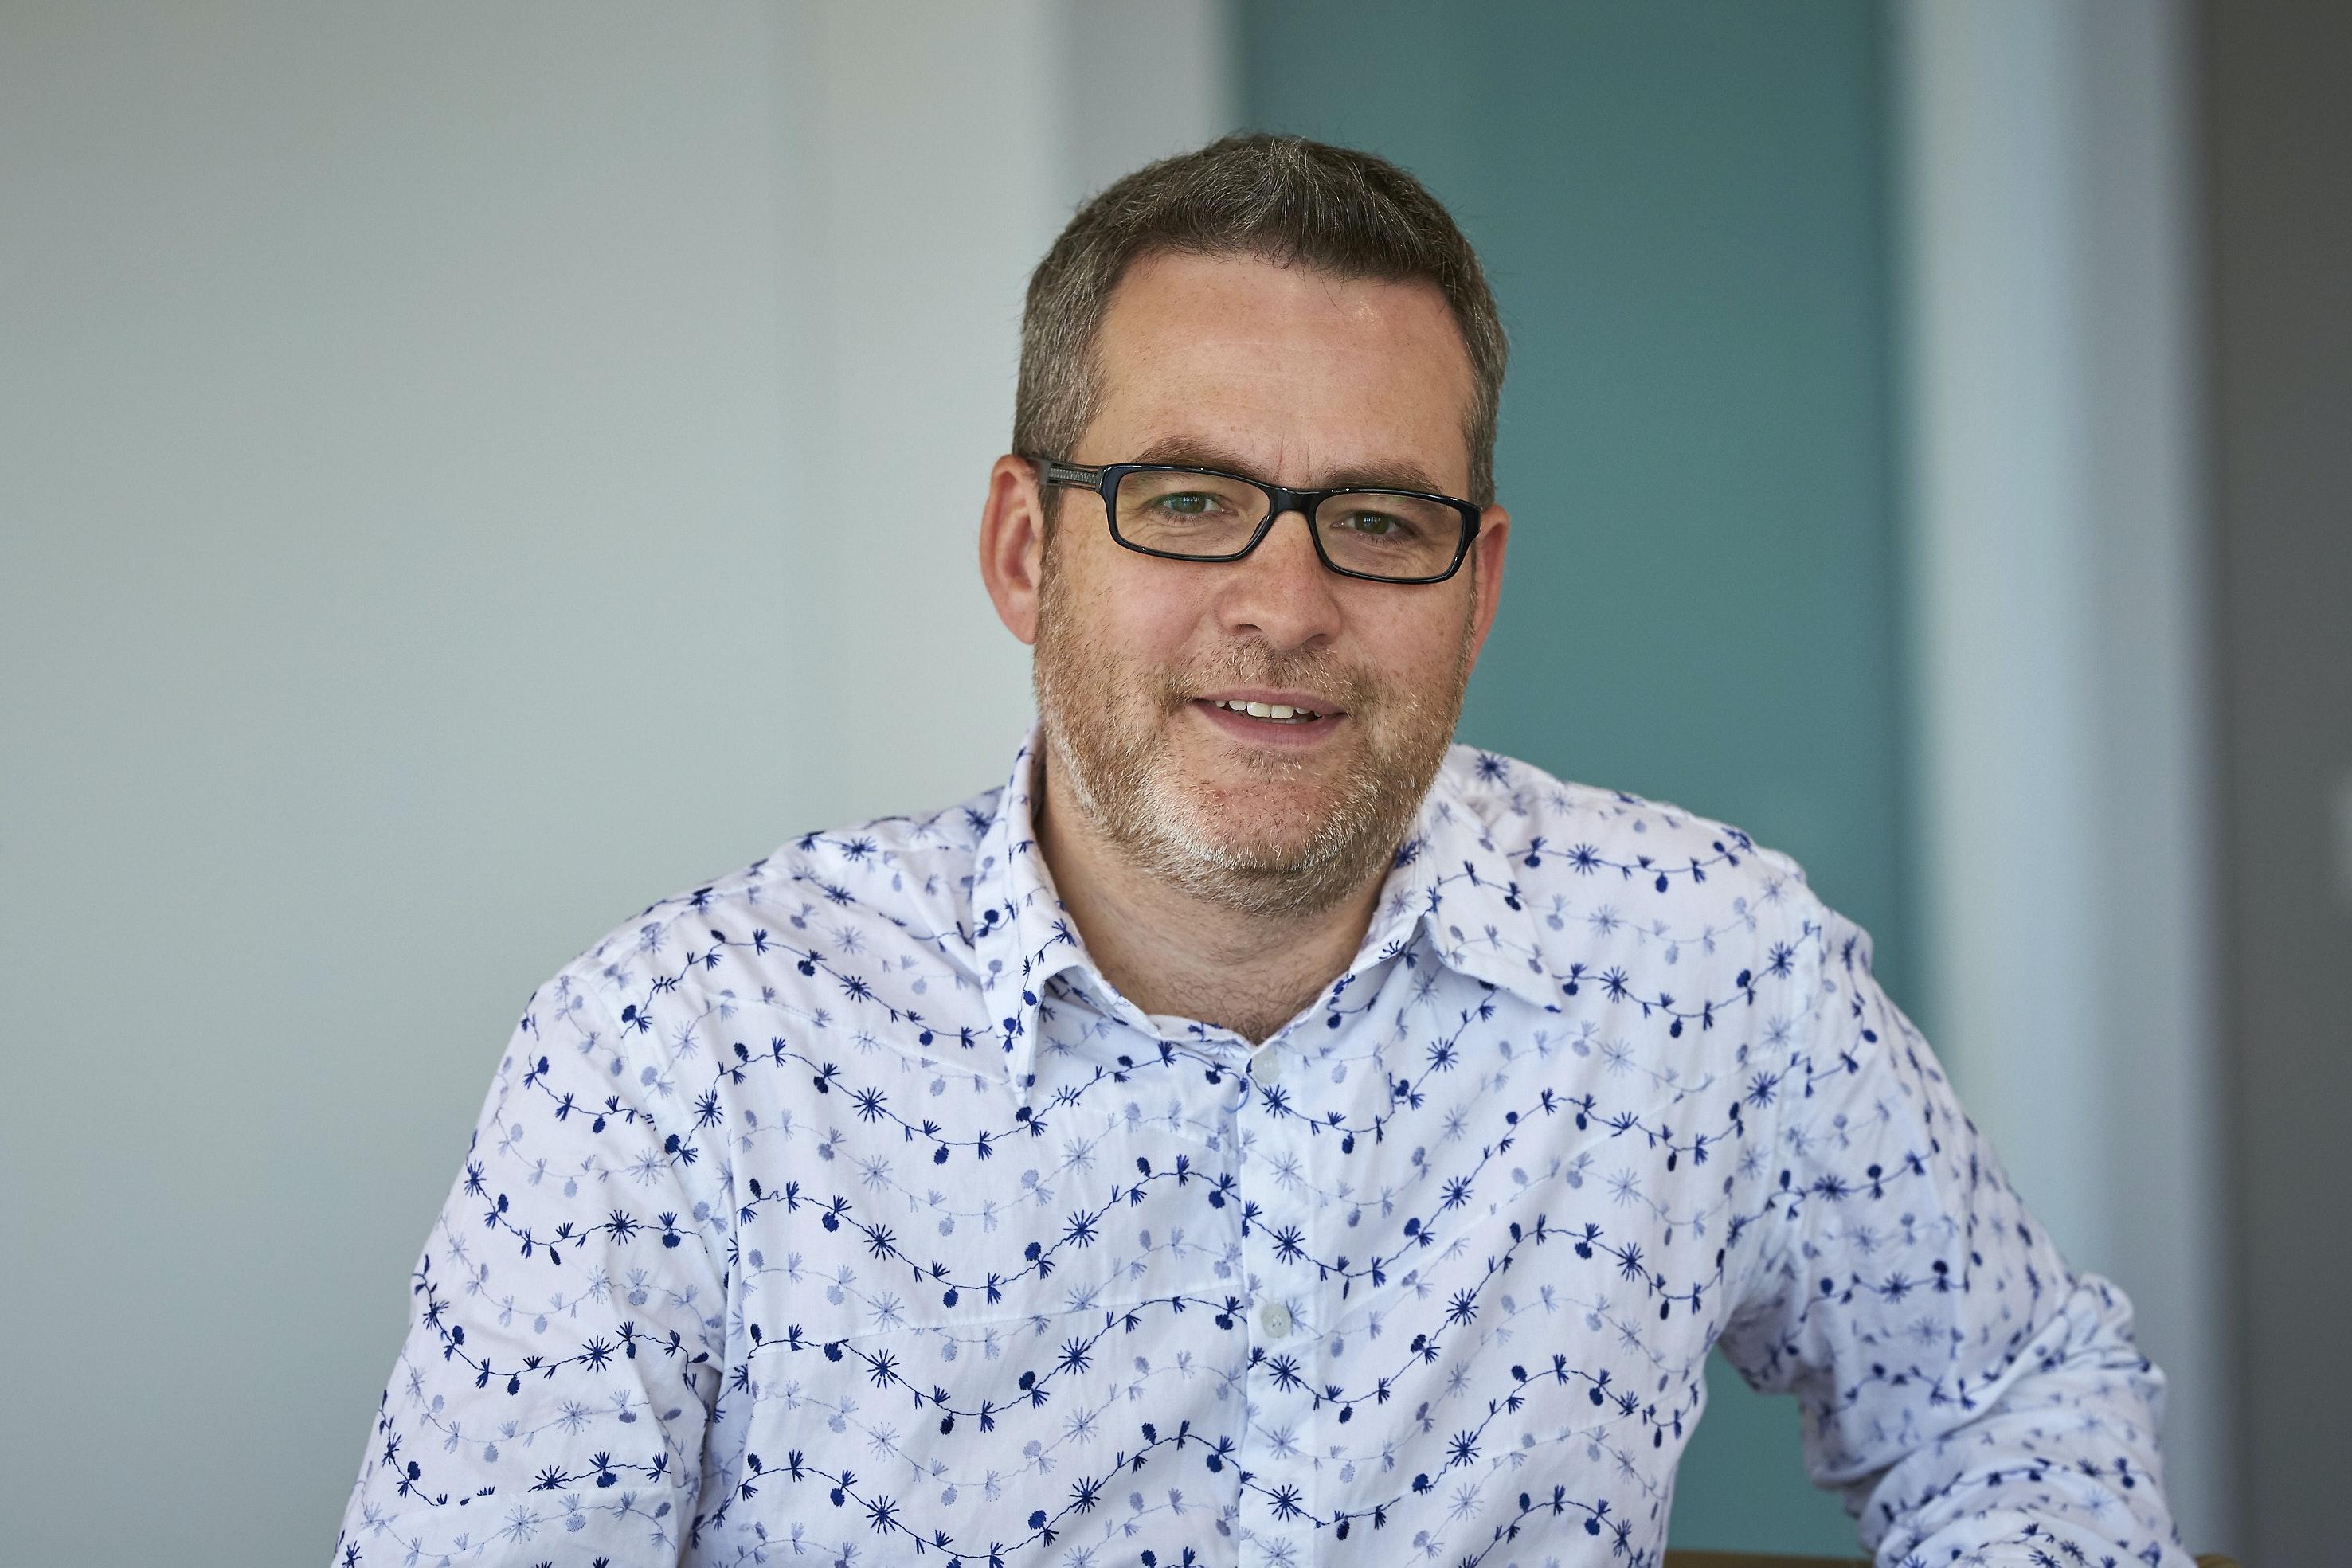 Managing Director, Aviva Ventures